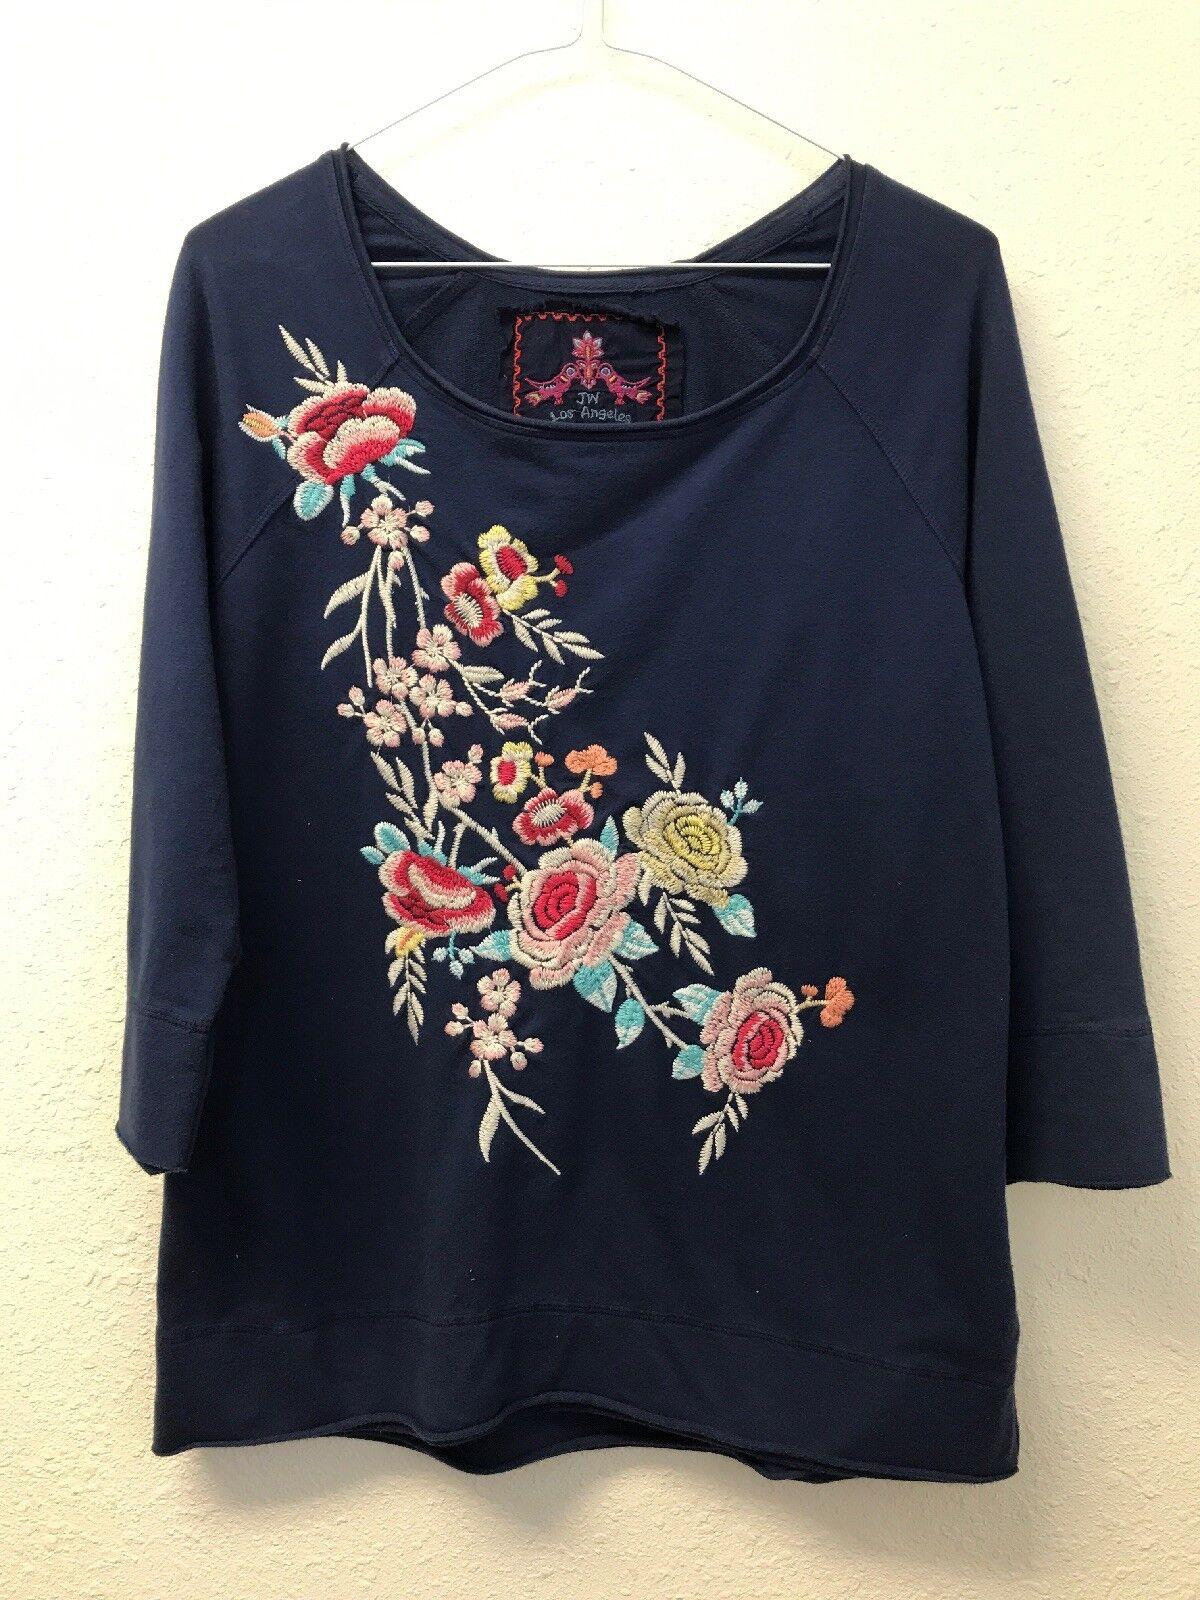 NWT Johnny Was JWLA damen S Navy Blau Embroiderot Cotton Shirt 3 4 Sleeve